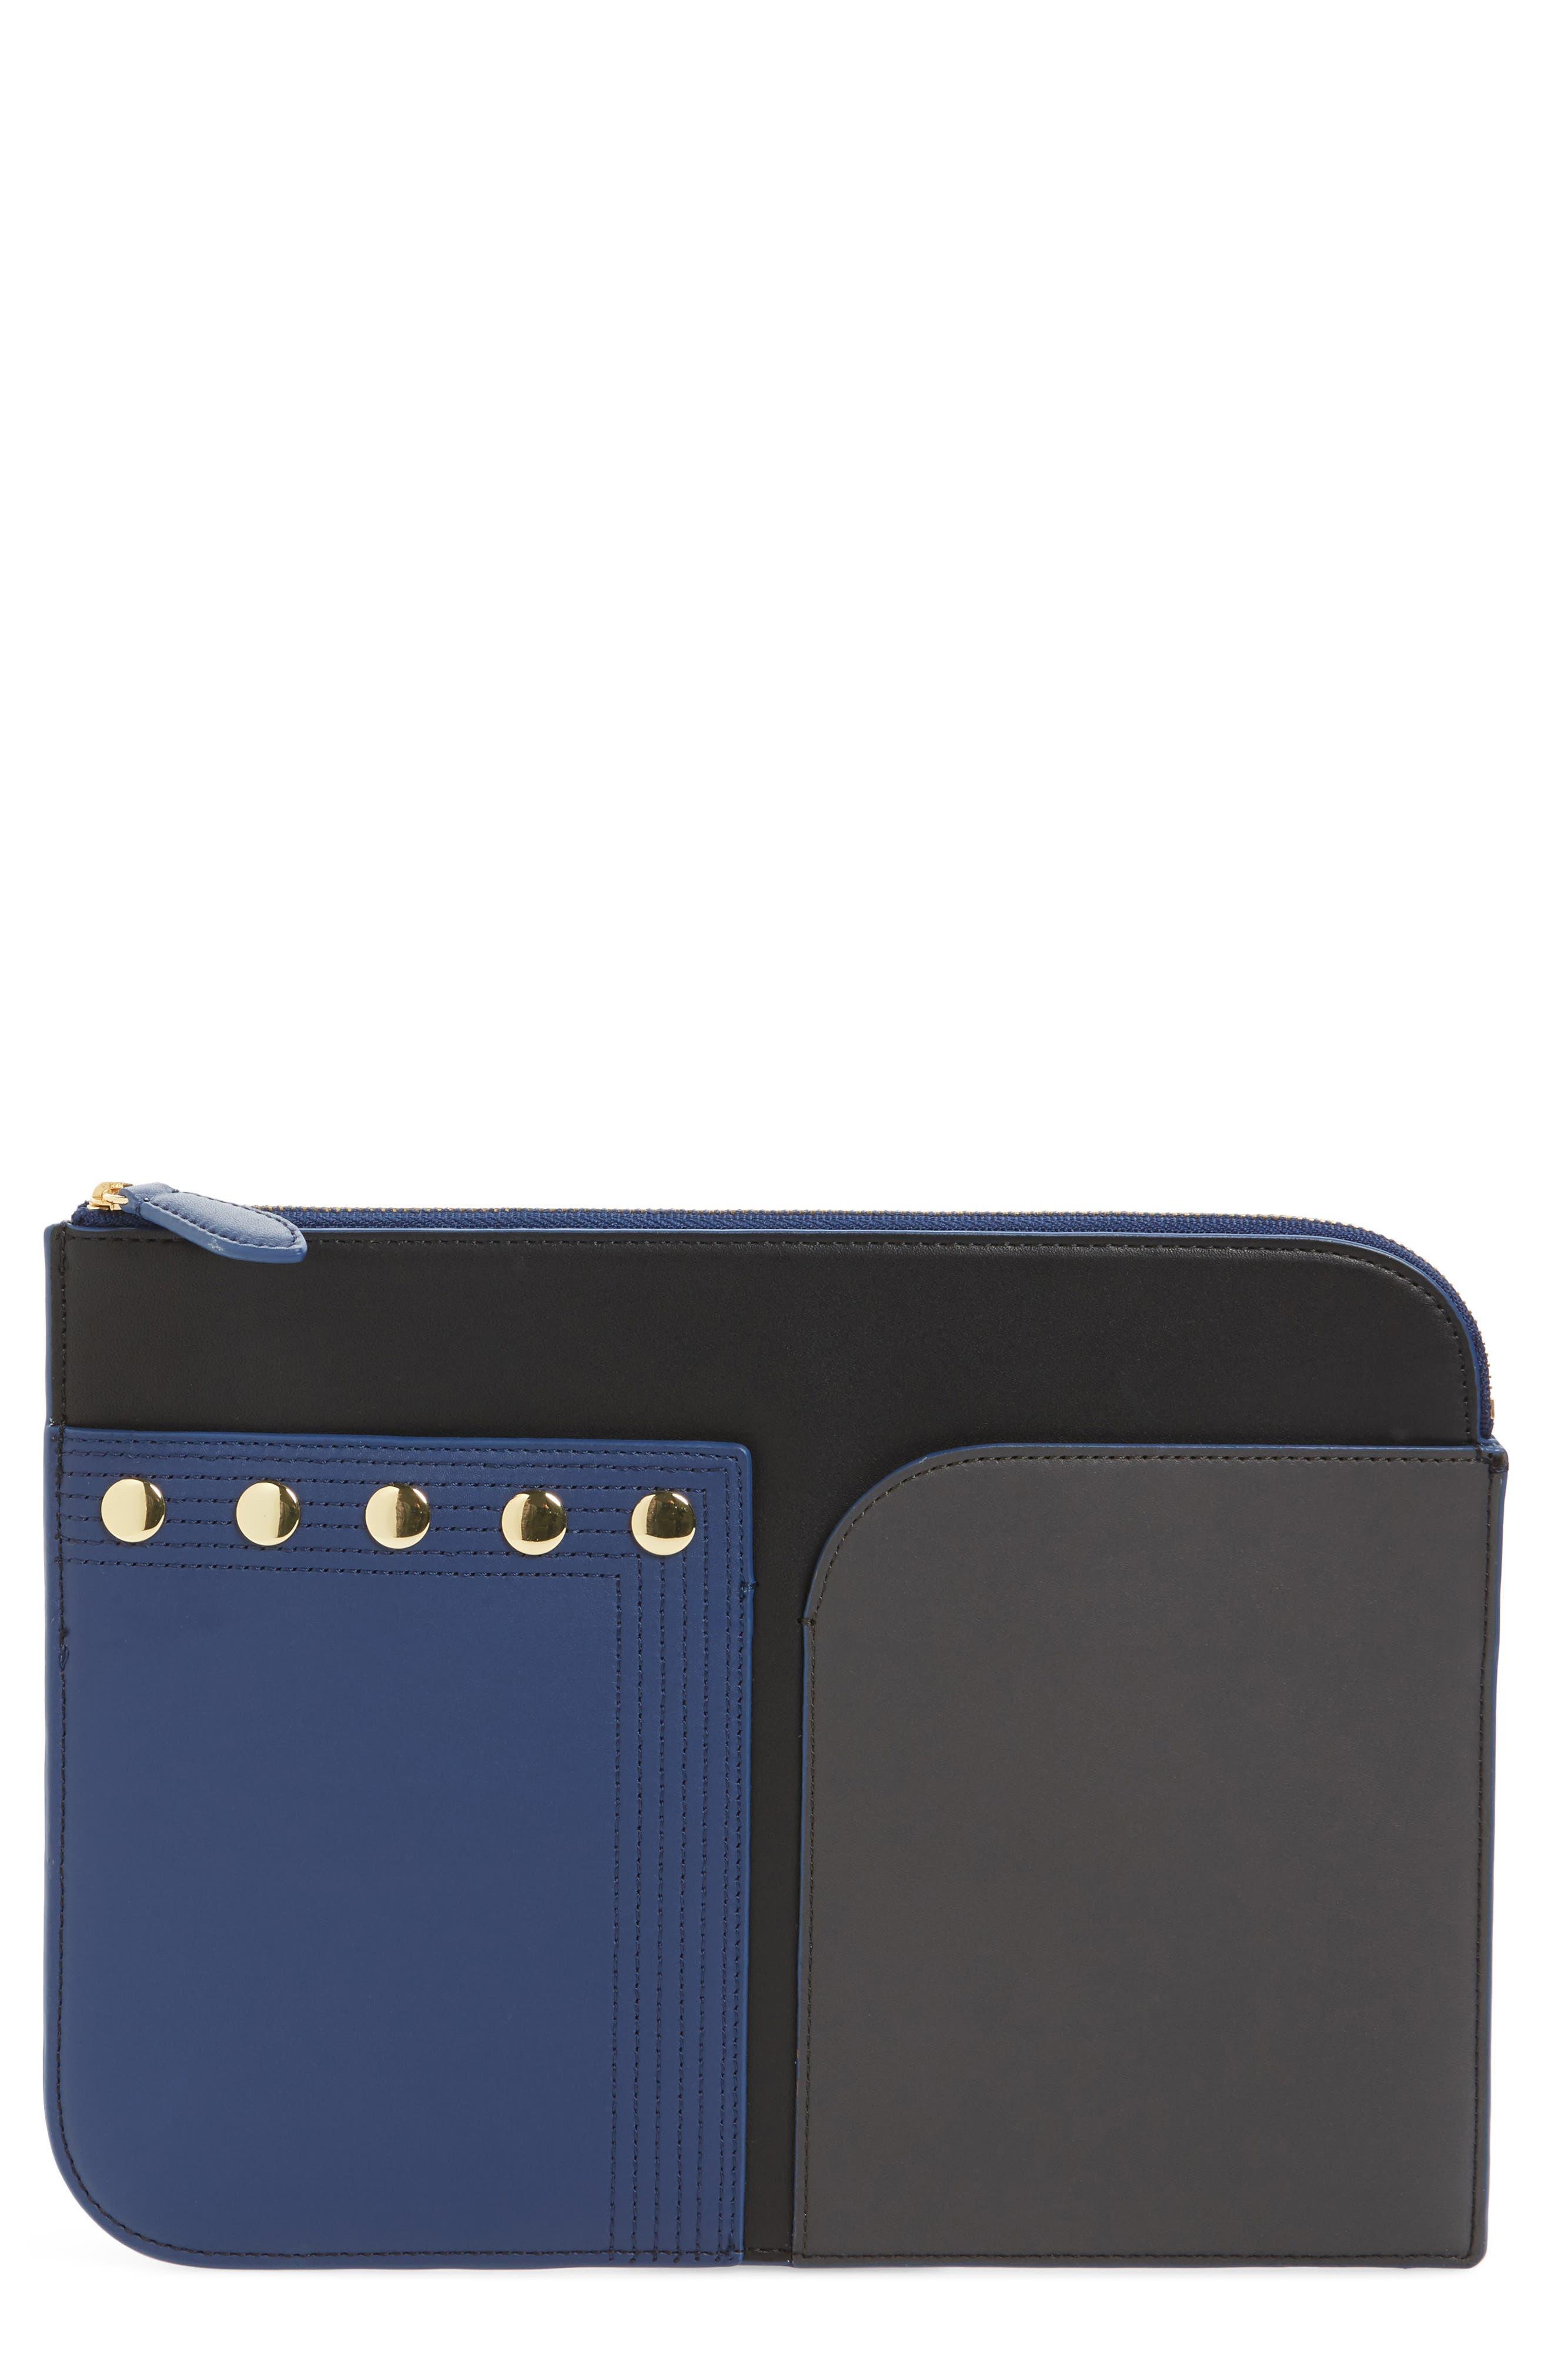 Large Colorblock Leather Zip Pouch,                         Main,                         color, 402